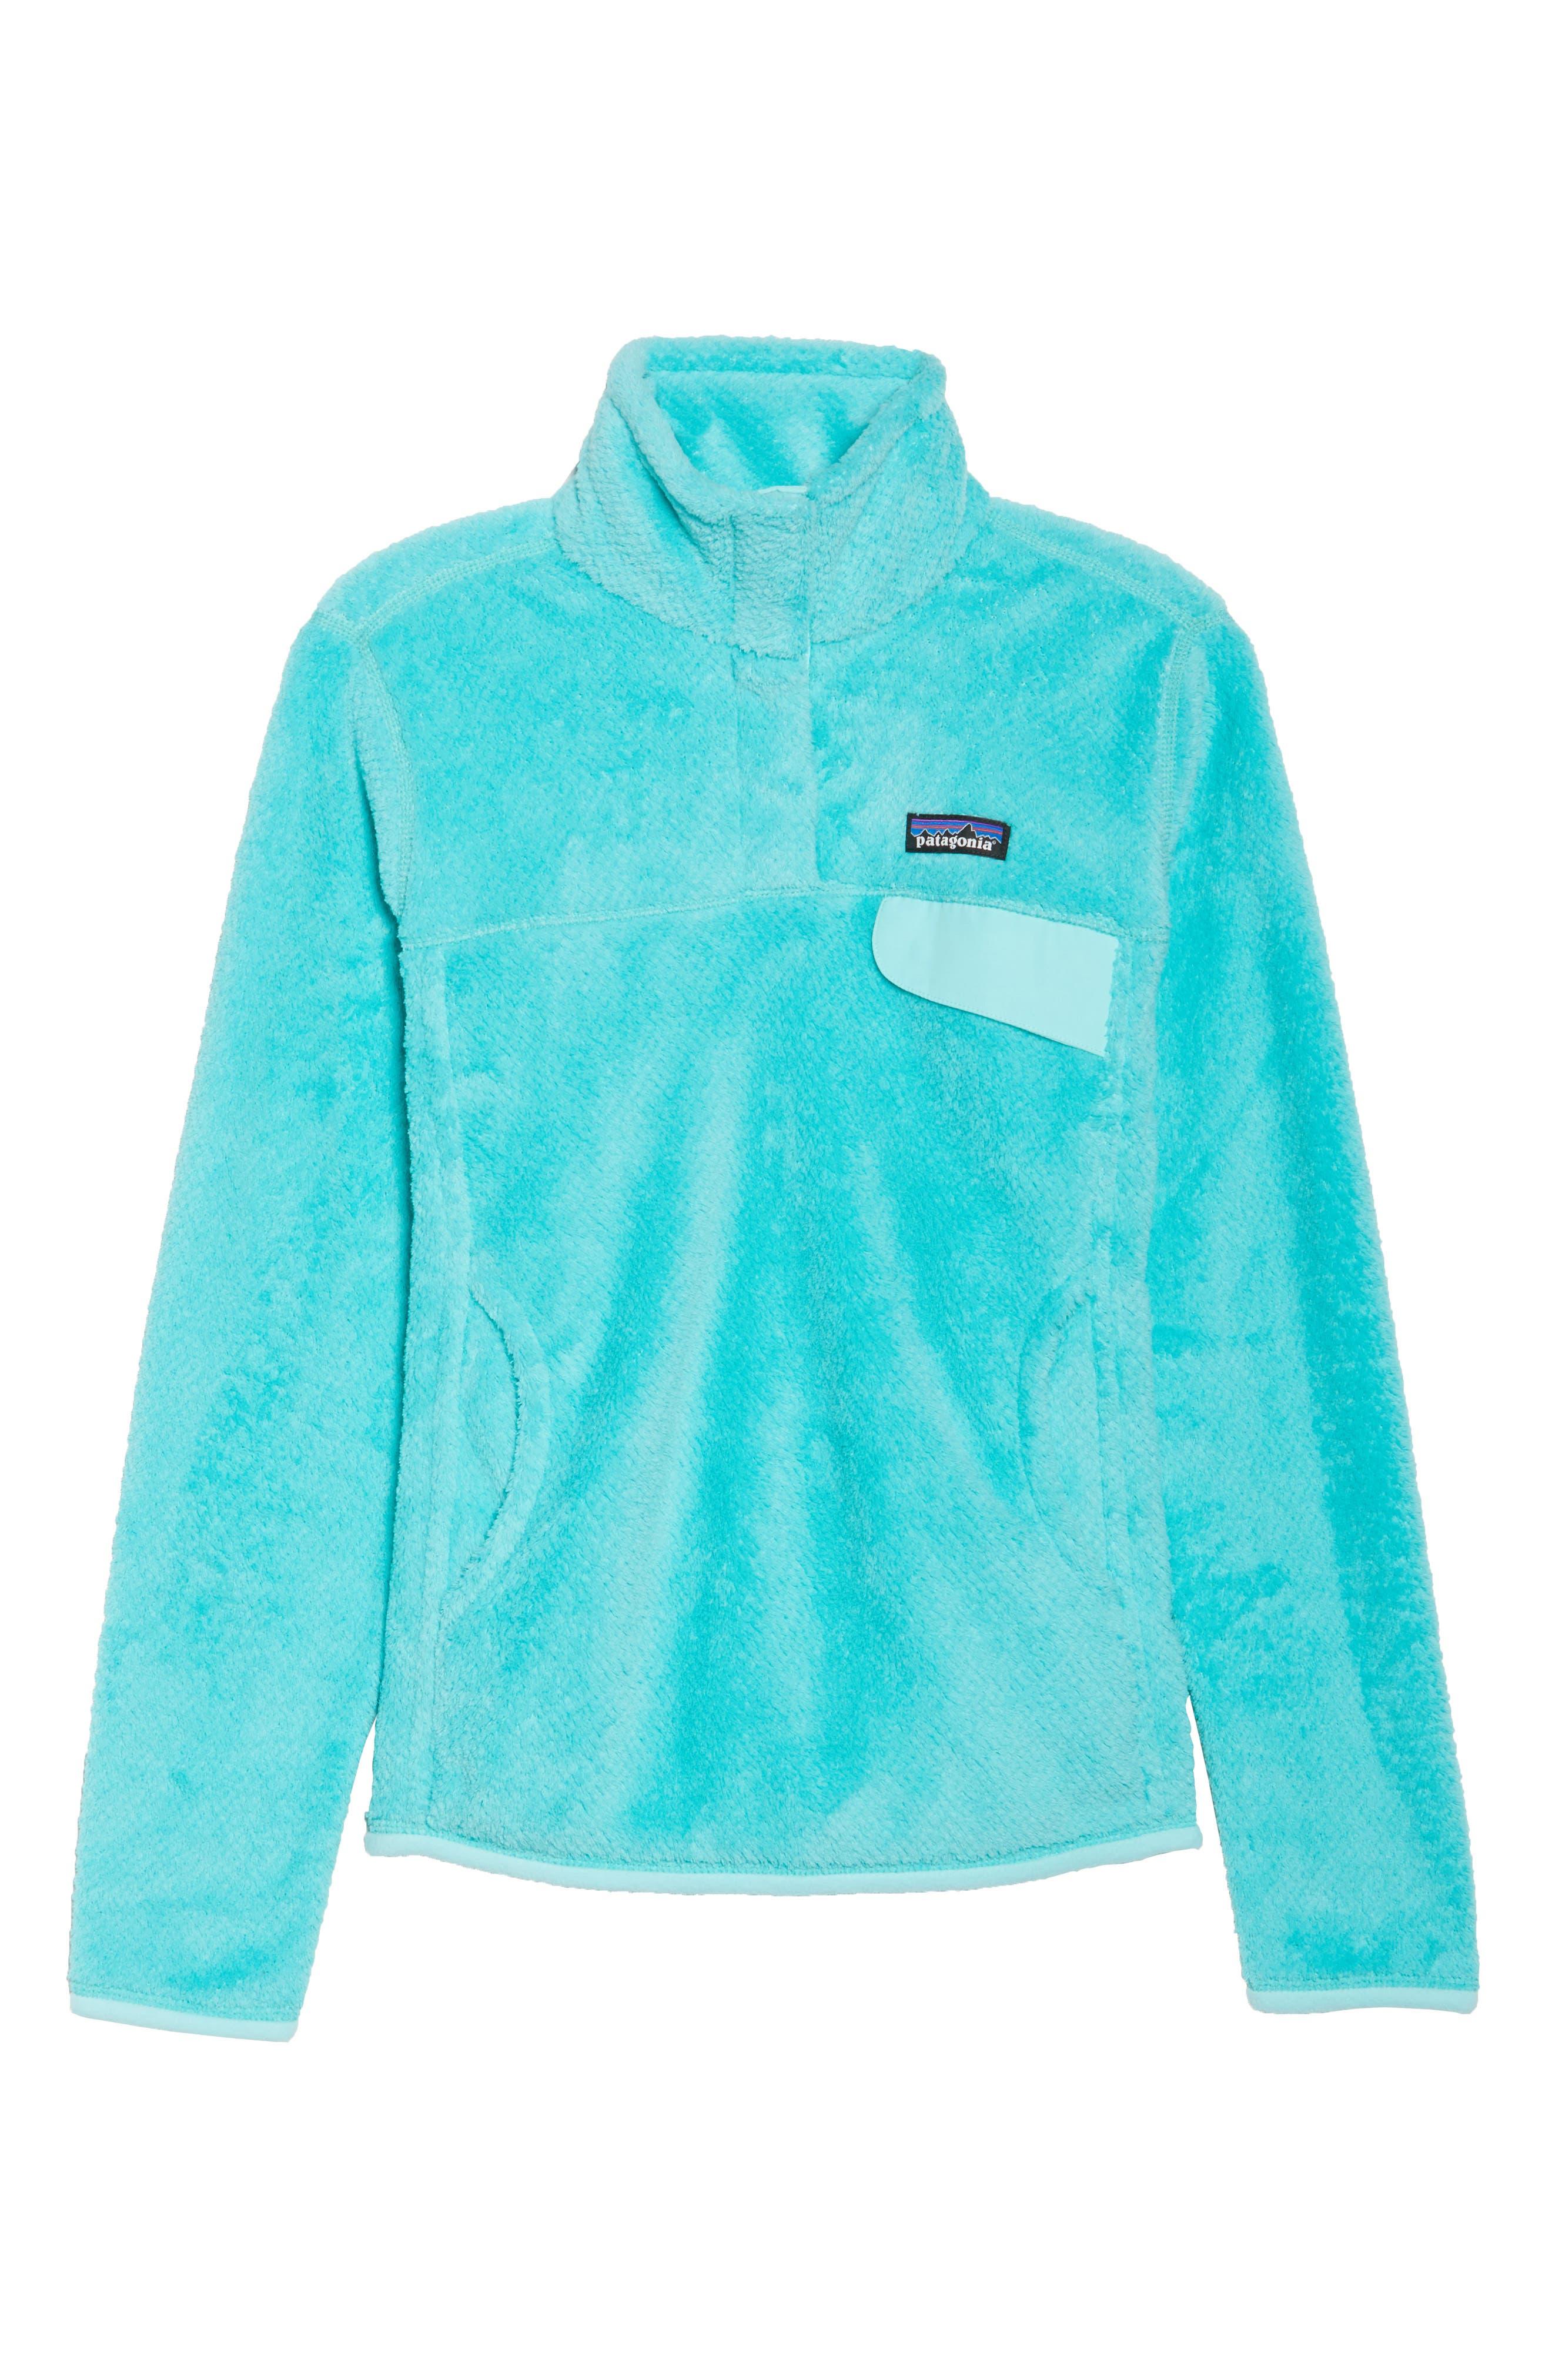 Re-Tool Snap-T<sup>®</sup> Fleece Pullover,                             Alternate thumbnail 7, color,                             Bend Blue/ Strait Blue X Dye